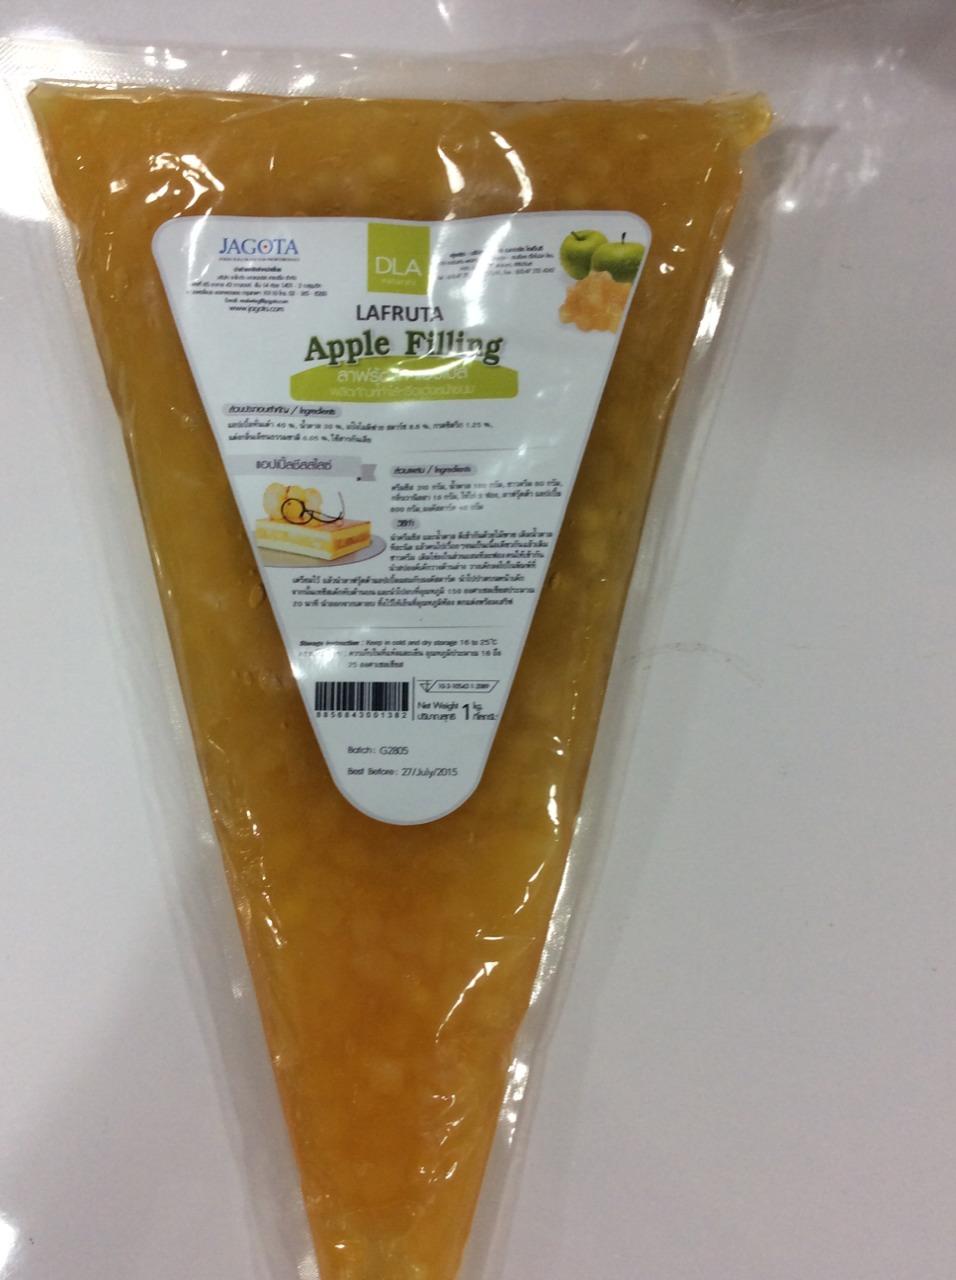 Lafruta apple filling